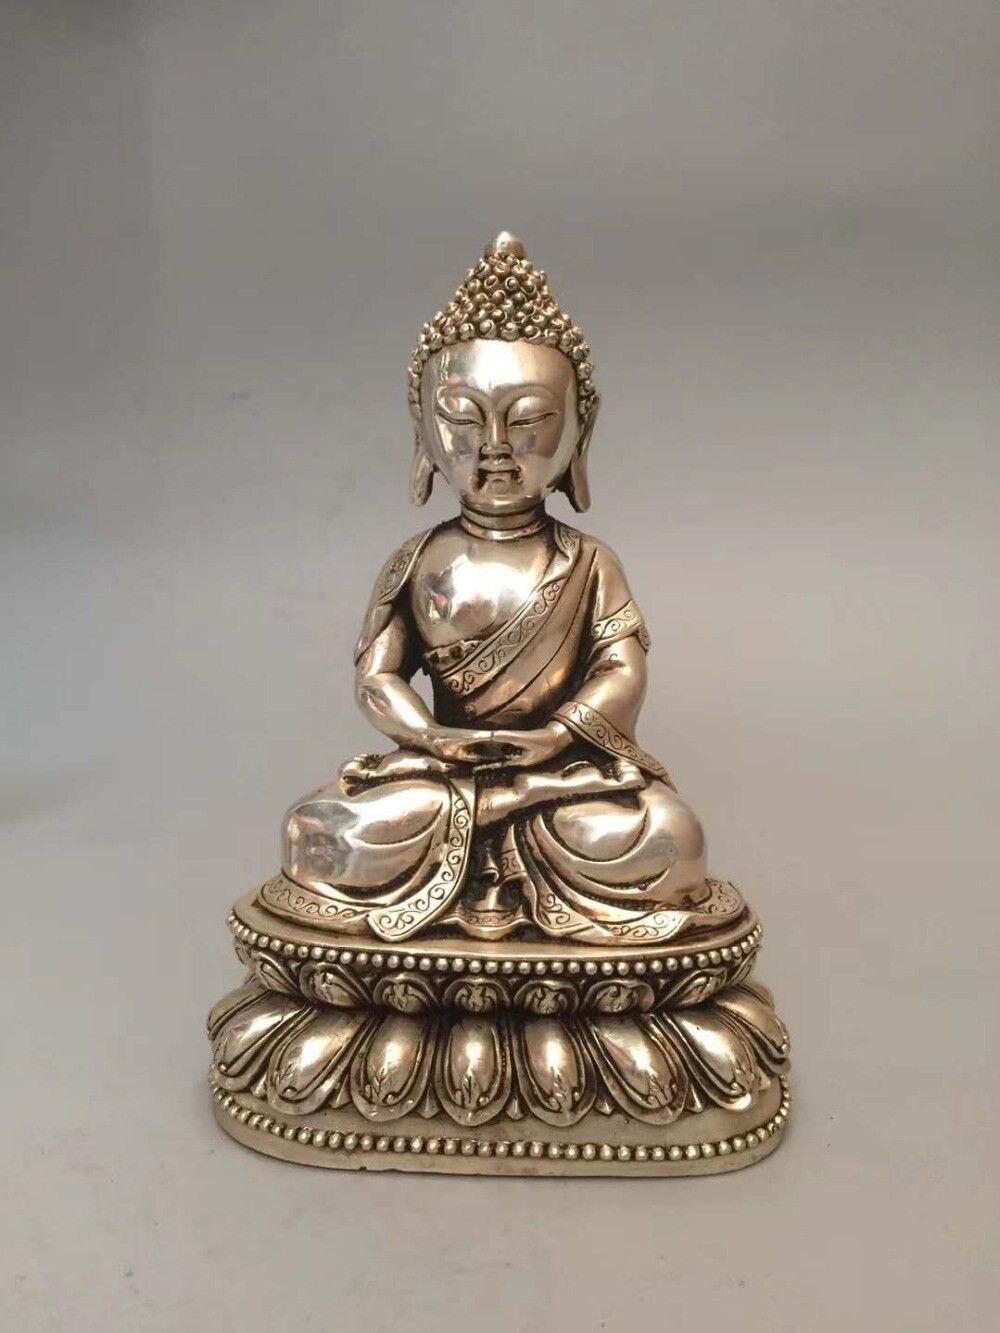 Collectible archaize white copper Sakyamuni Buddha statueCollectible archaize white copper Sakyamuni Buddha statue